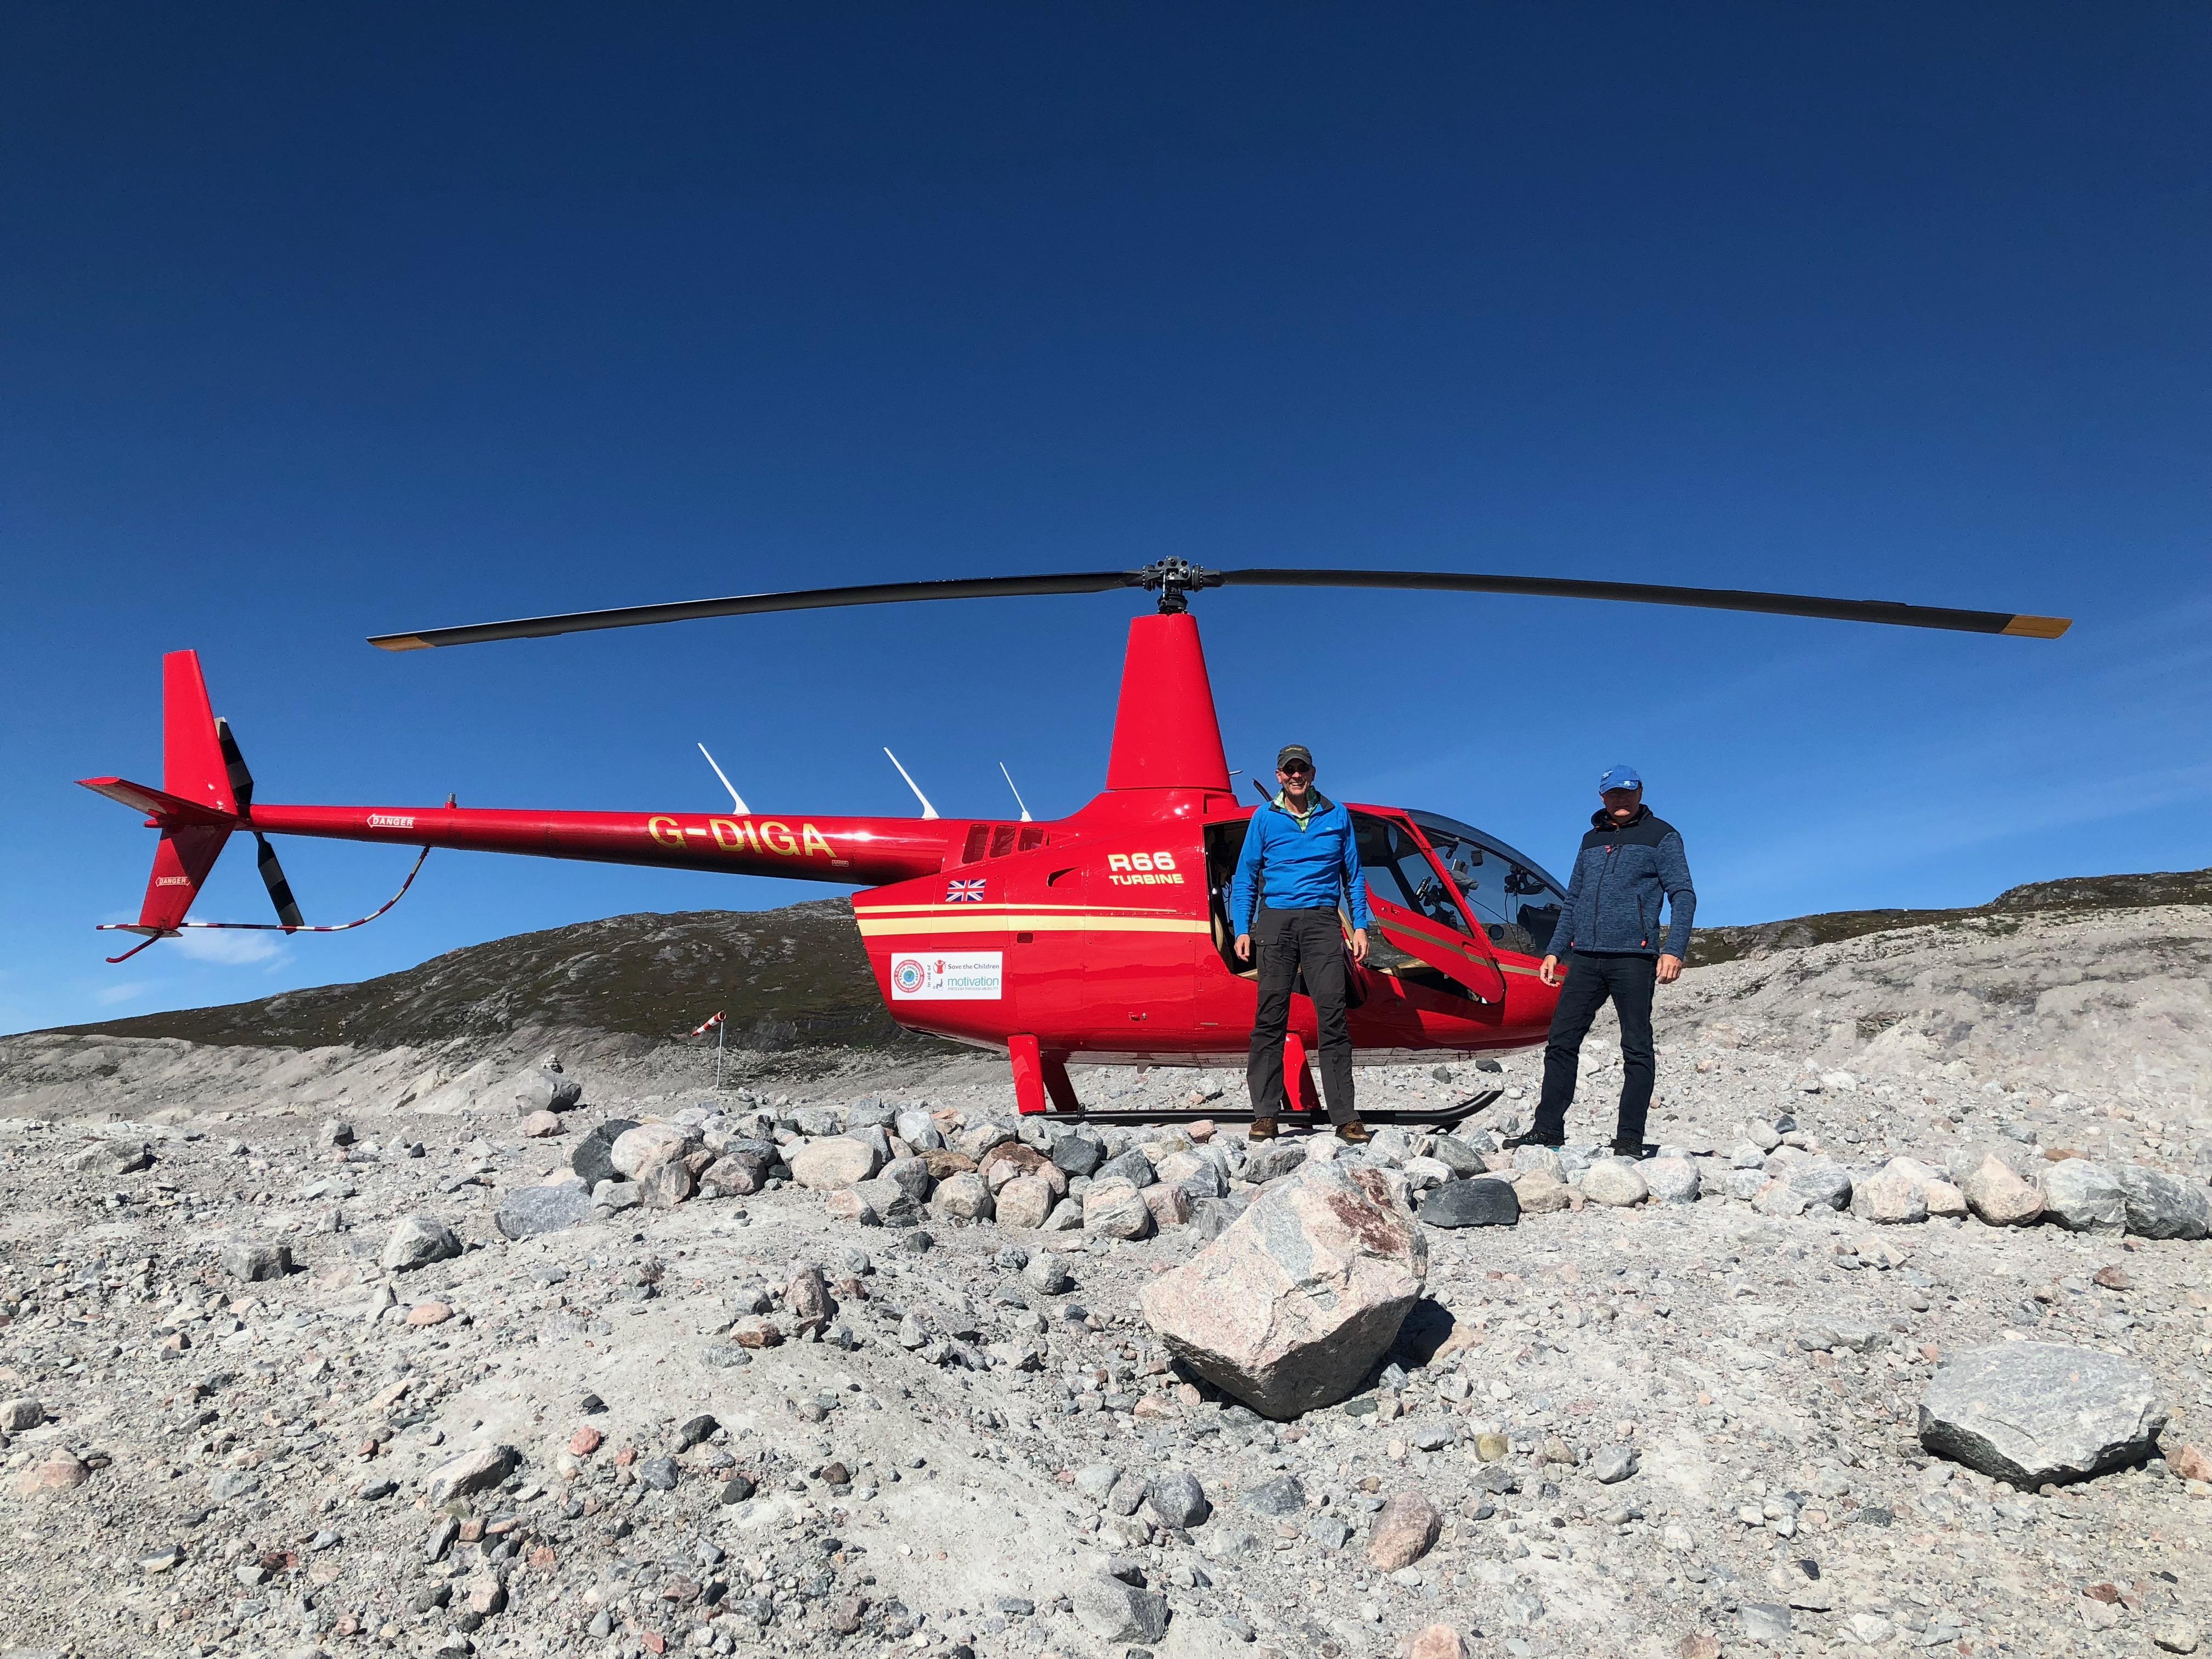 IMG_5978 Helipad at Dead Glacier